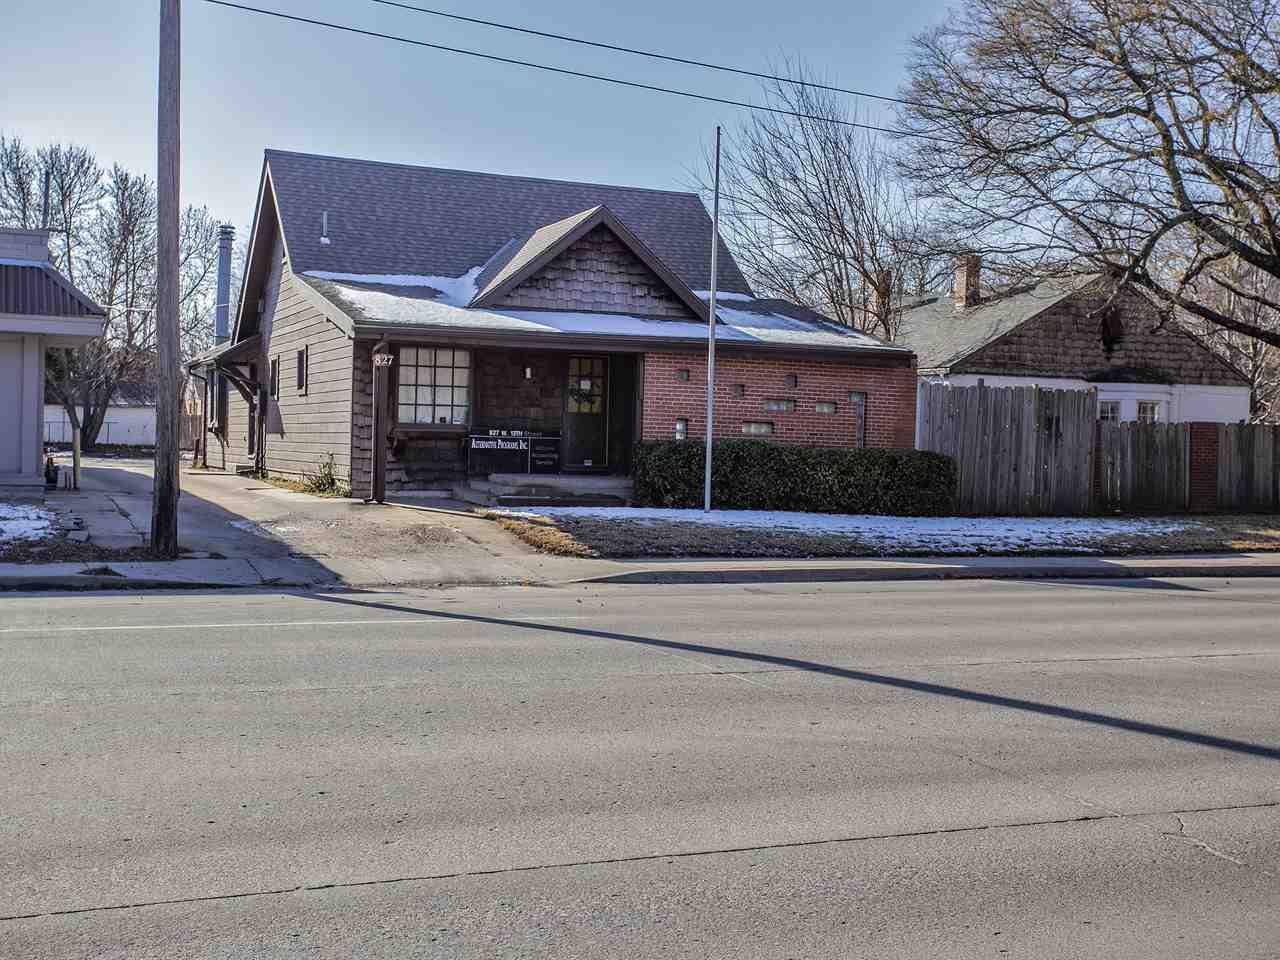 For Sale: 827 W 13TH ST N, Wichita KS